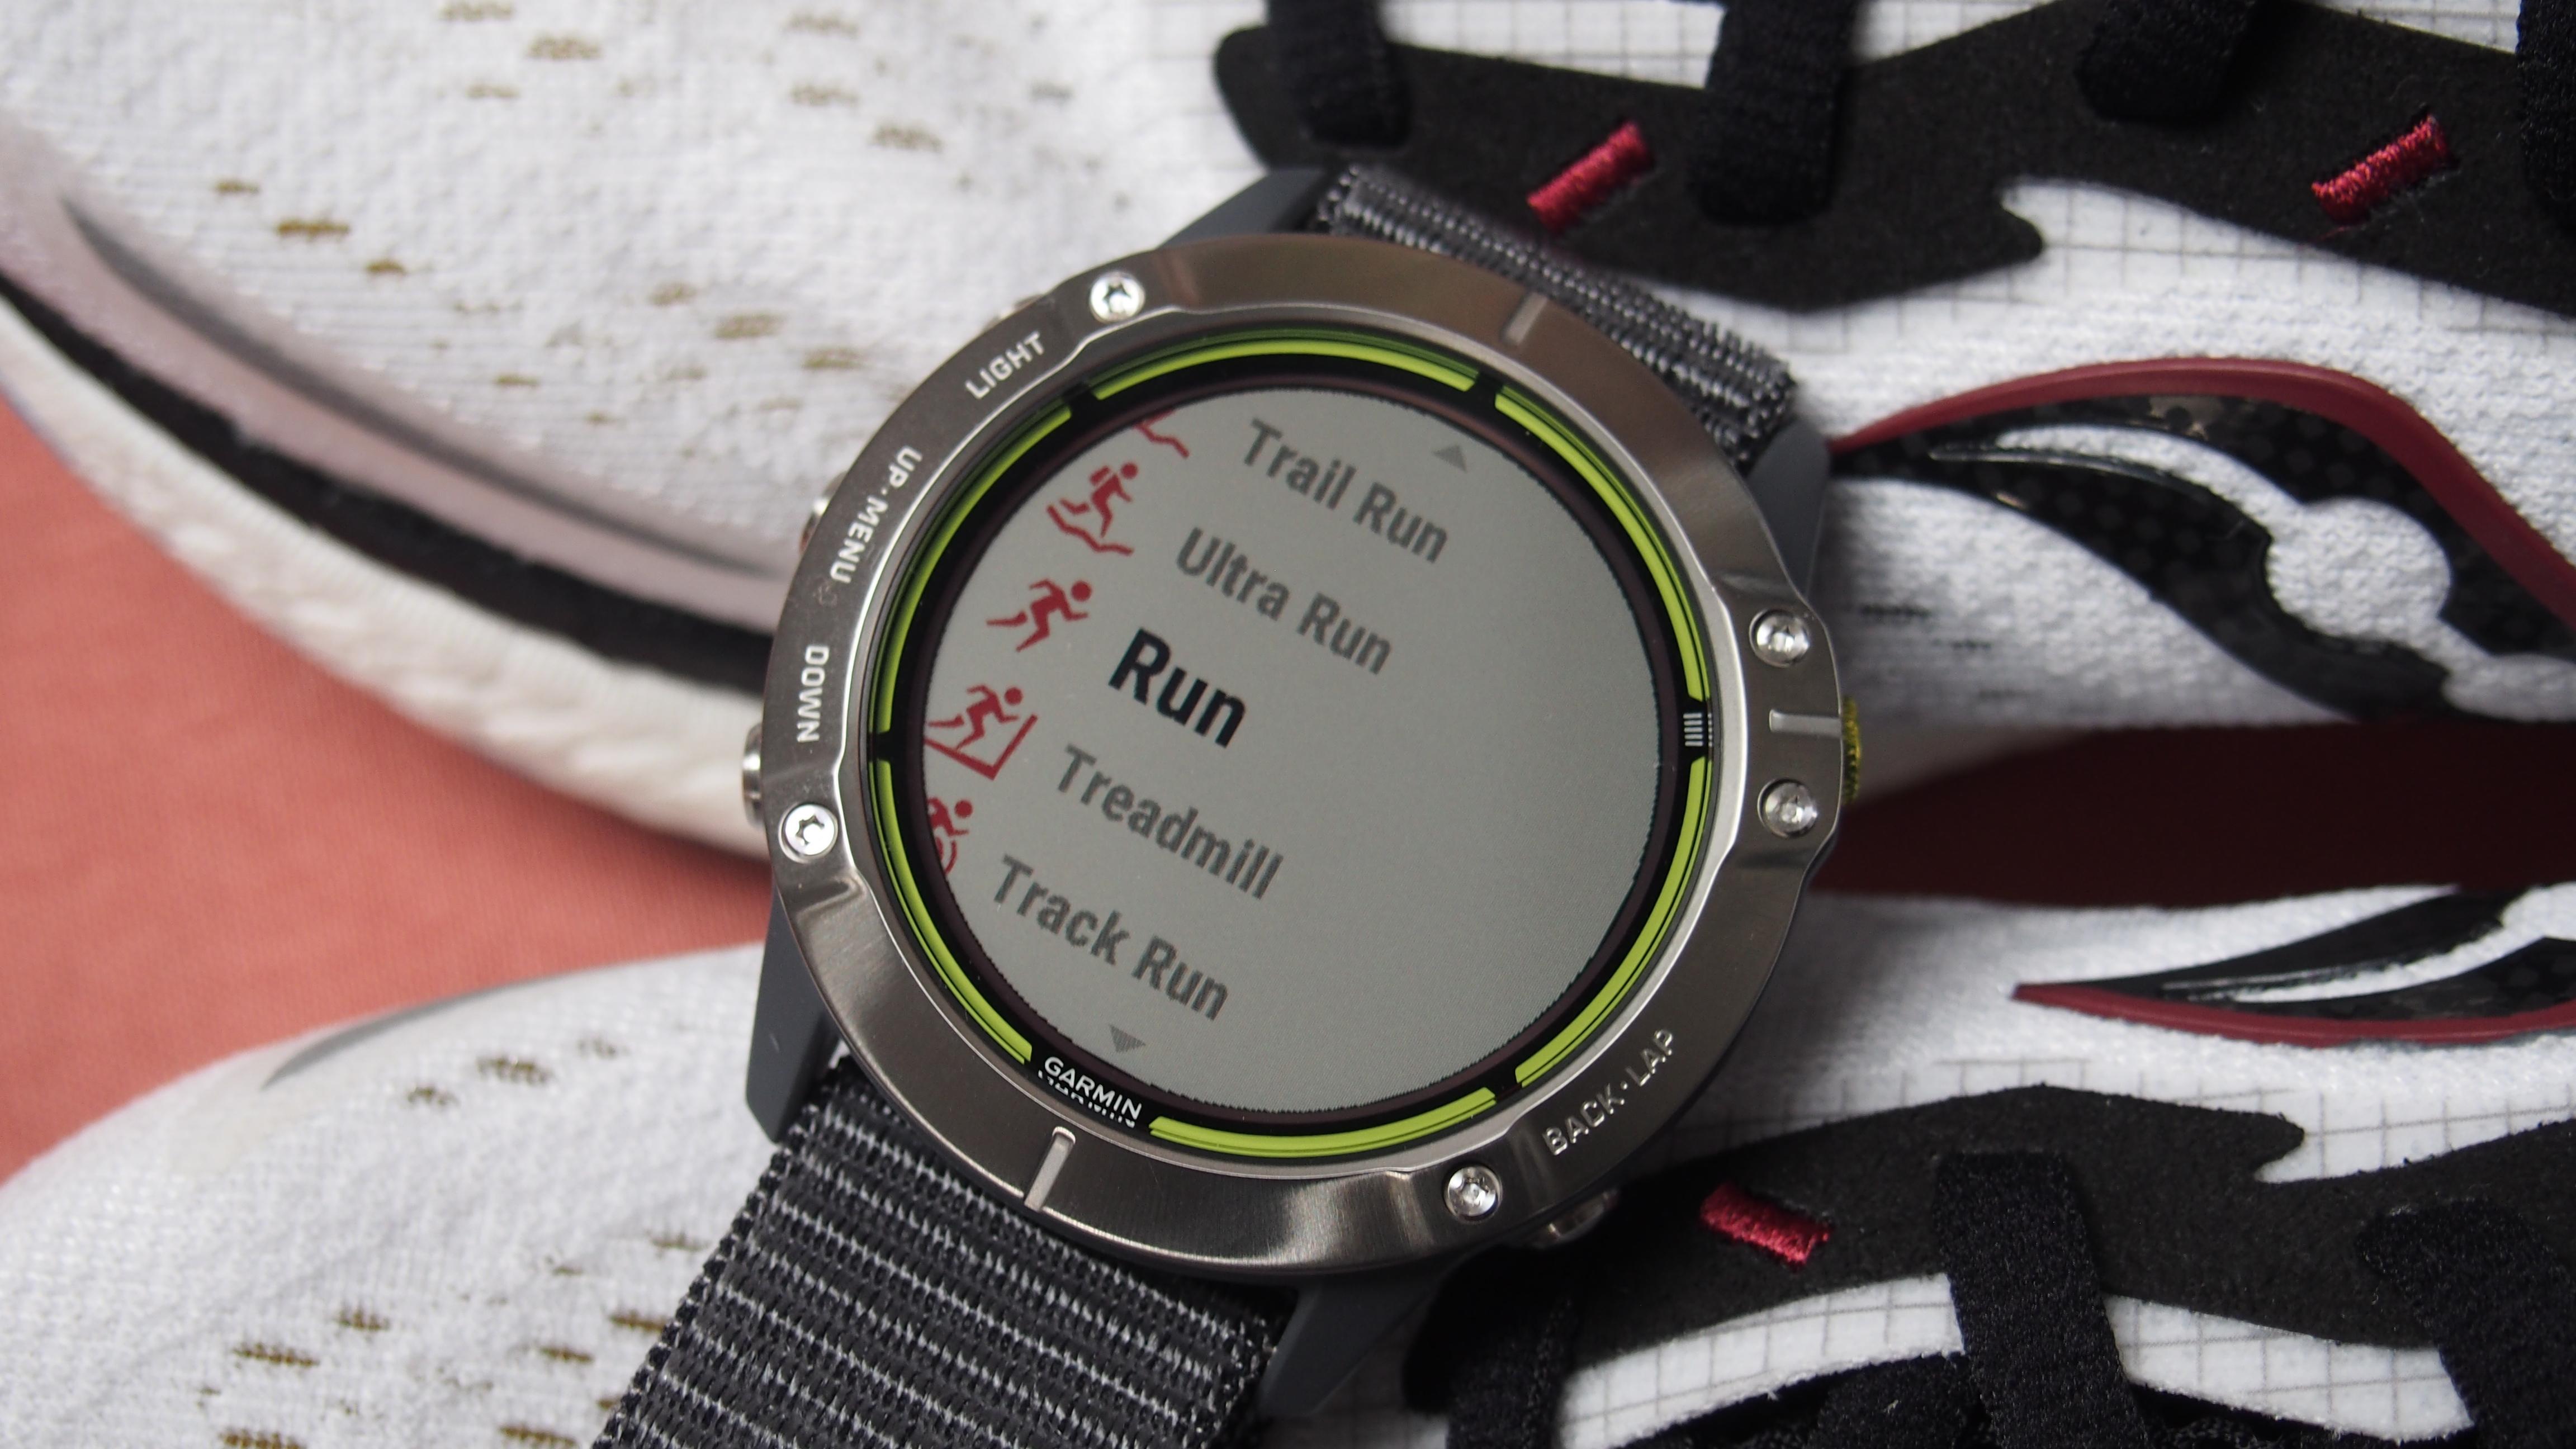 Garmin Enduro showing menu of activity tracking options